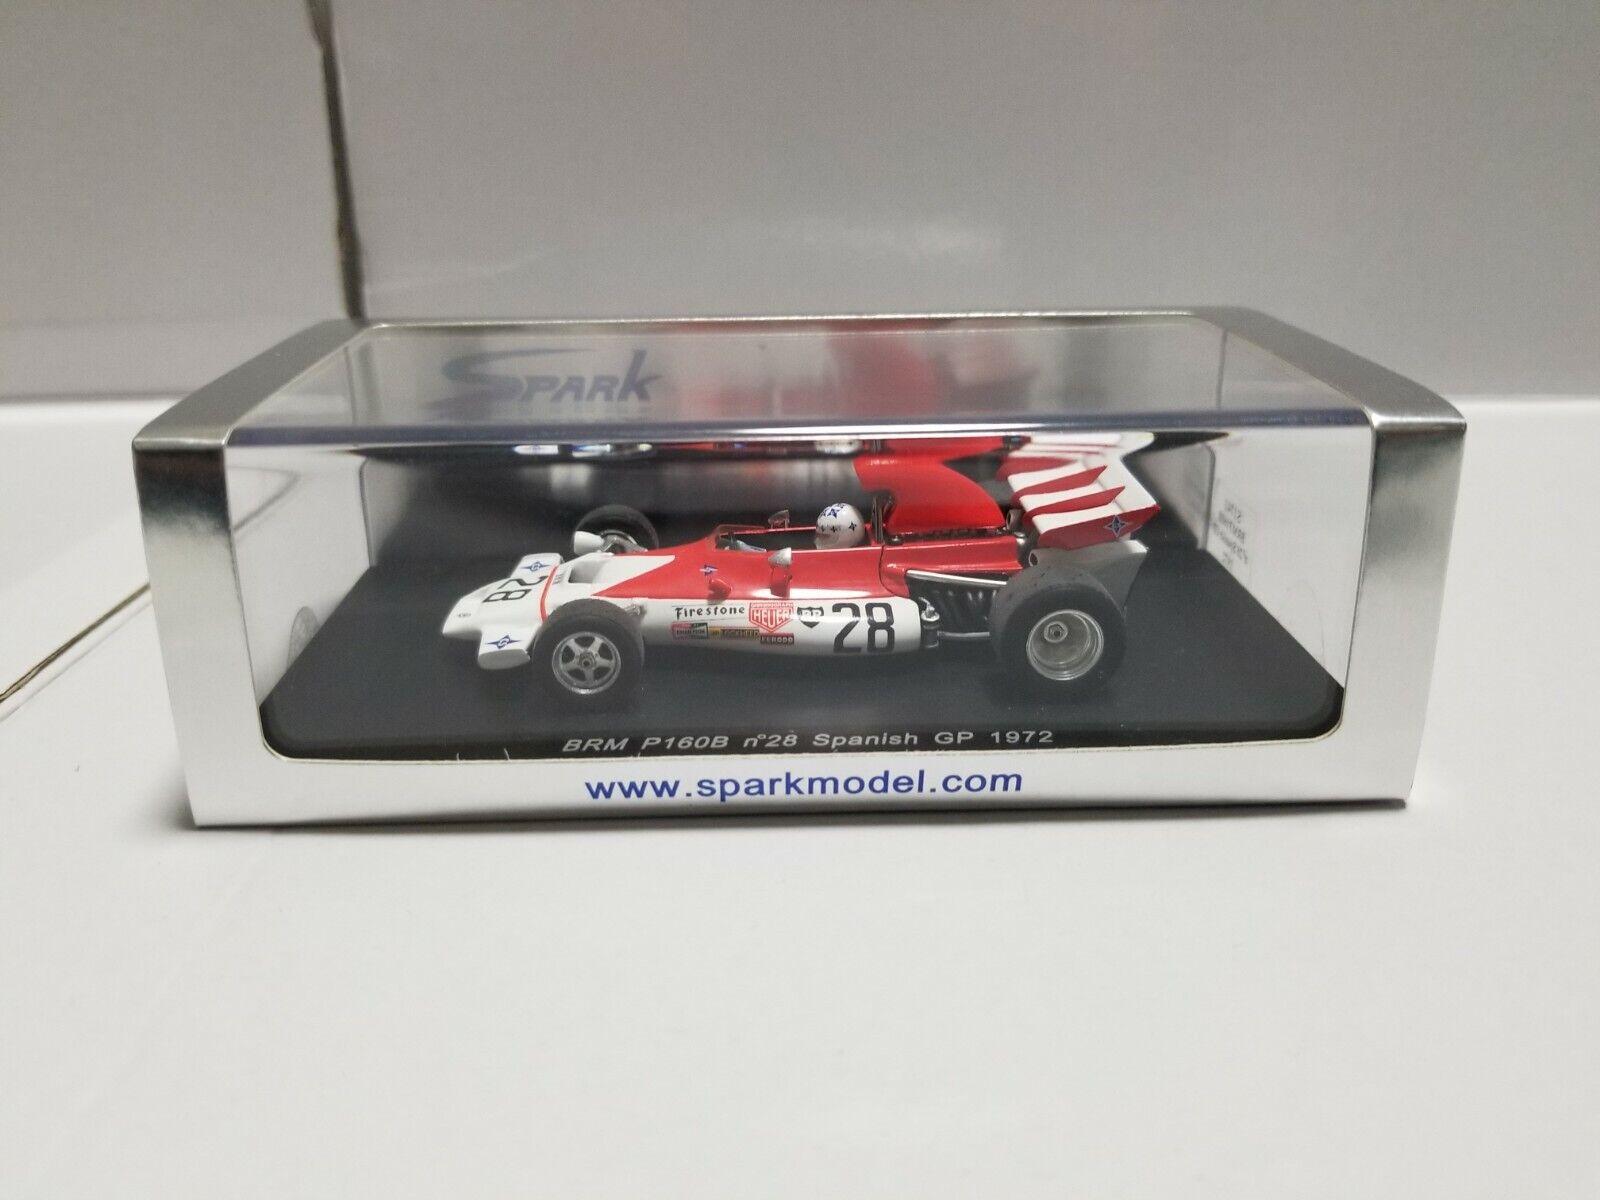 Spark BRM P160B español Grand Prix 1972 S1741 1 43